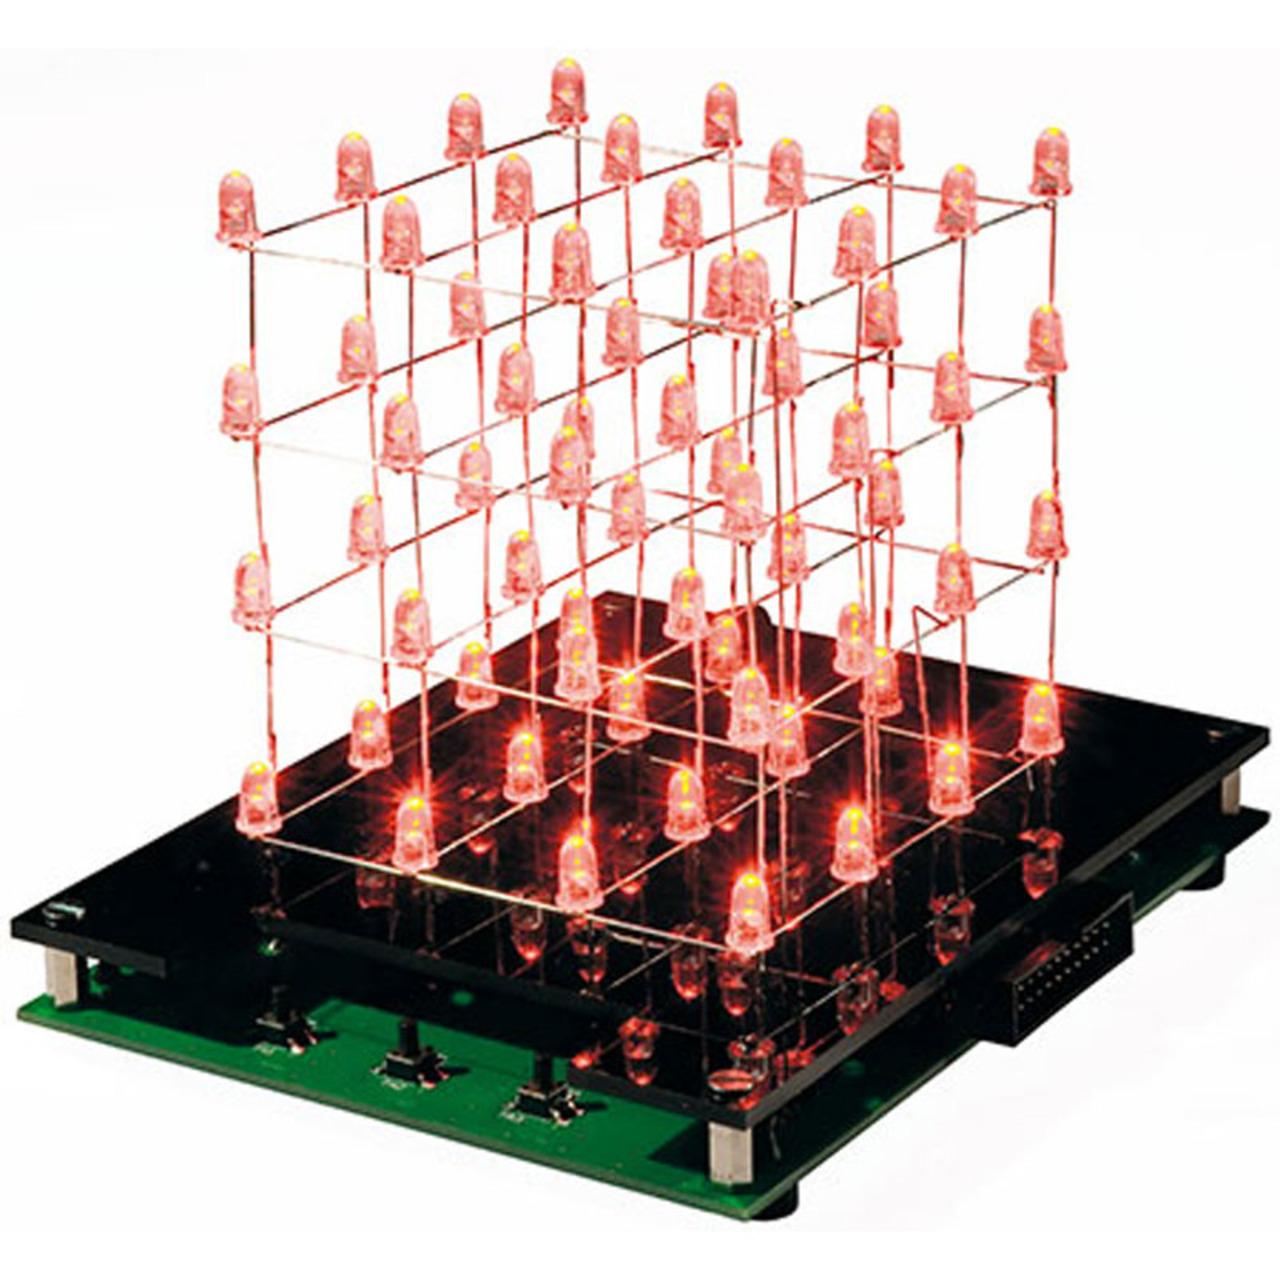 ELV Bausatz LED-Cube LC444- 4x4x4 LEDs